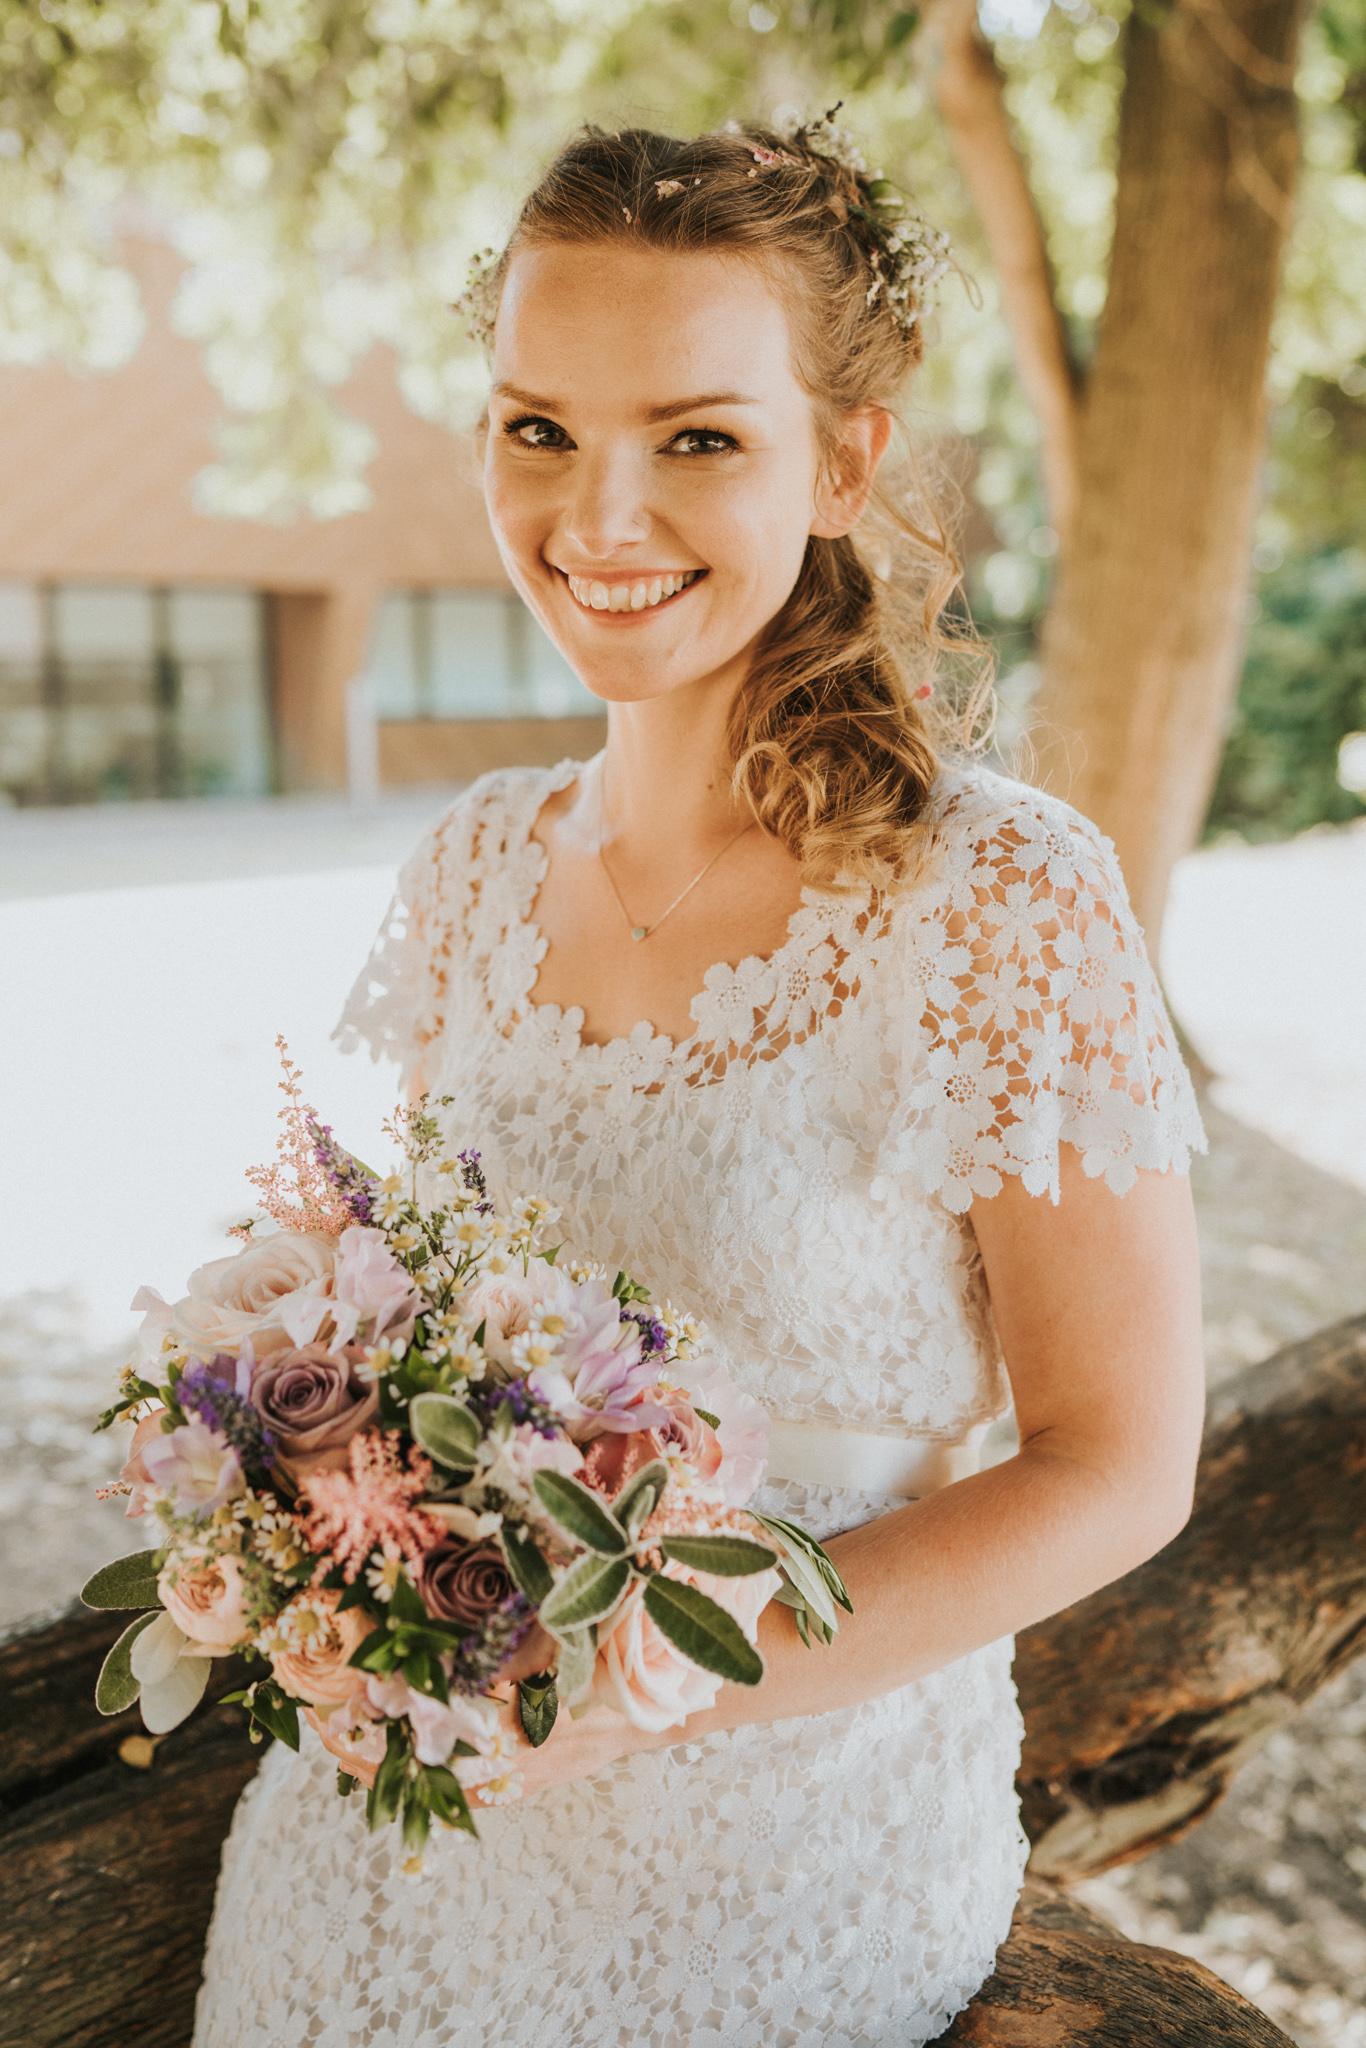 Grace-Elizabeth-Georgie-Amalaketu-Firstsite-Colchester-Essex-Boho-Buddhist-Wedding-Alternative-Wedding-Photography-Essex (87 of 100).jpg